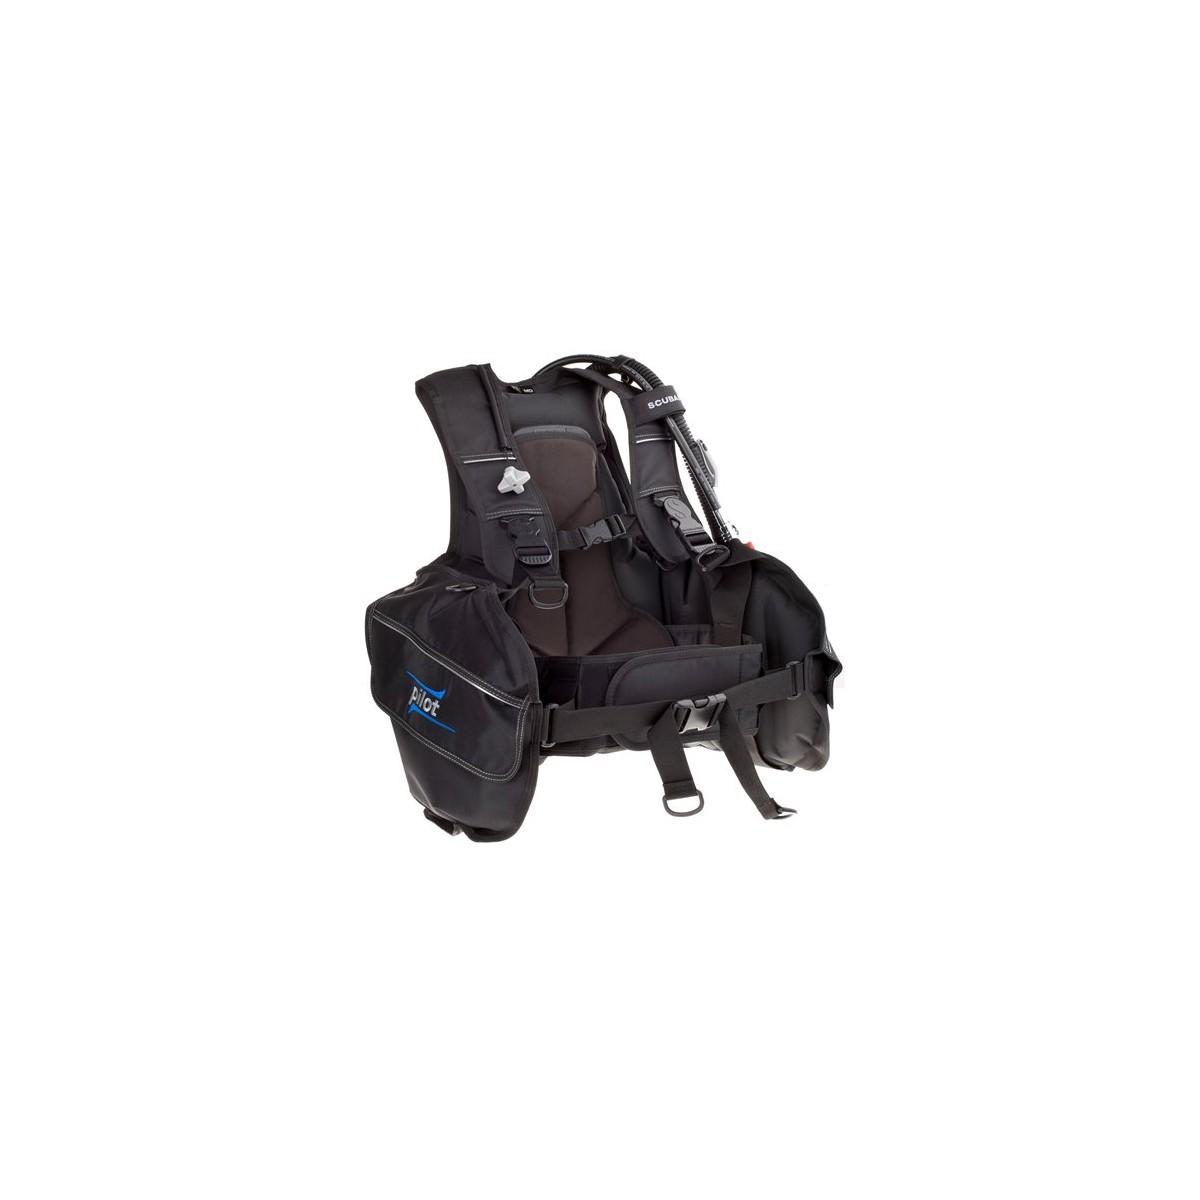 Scubapro Pilot Jacket Style Scuba Diving BCD W/ Balanced Inflator